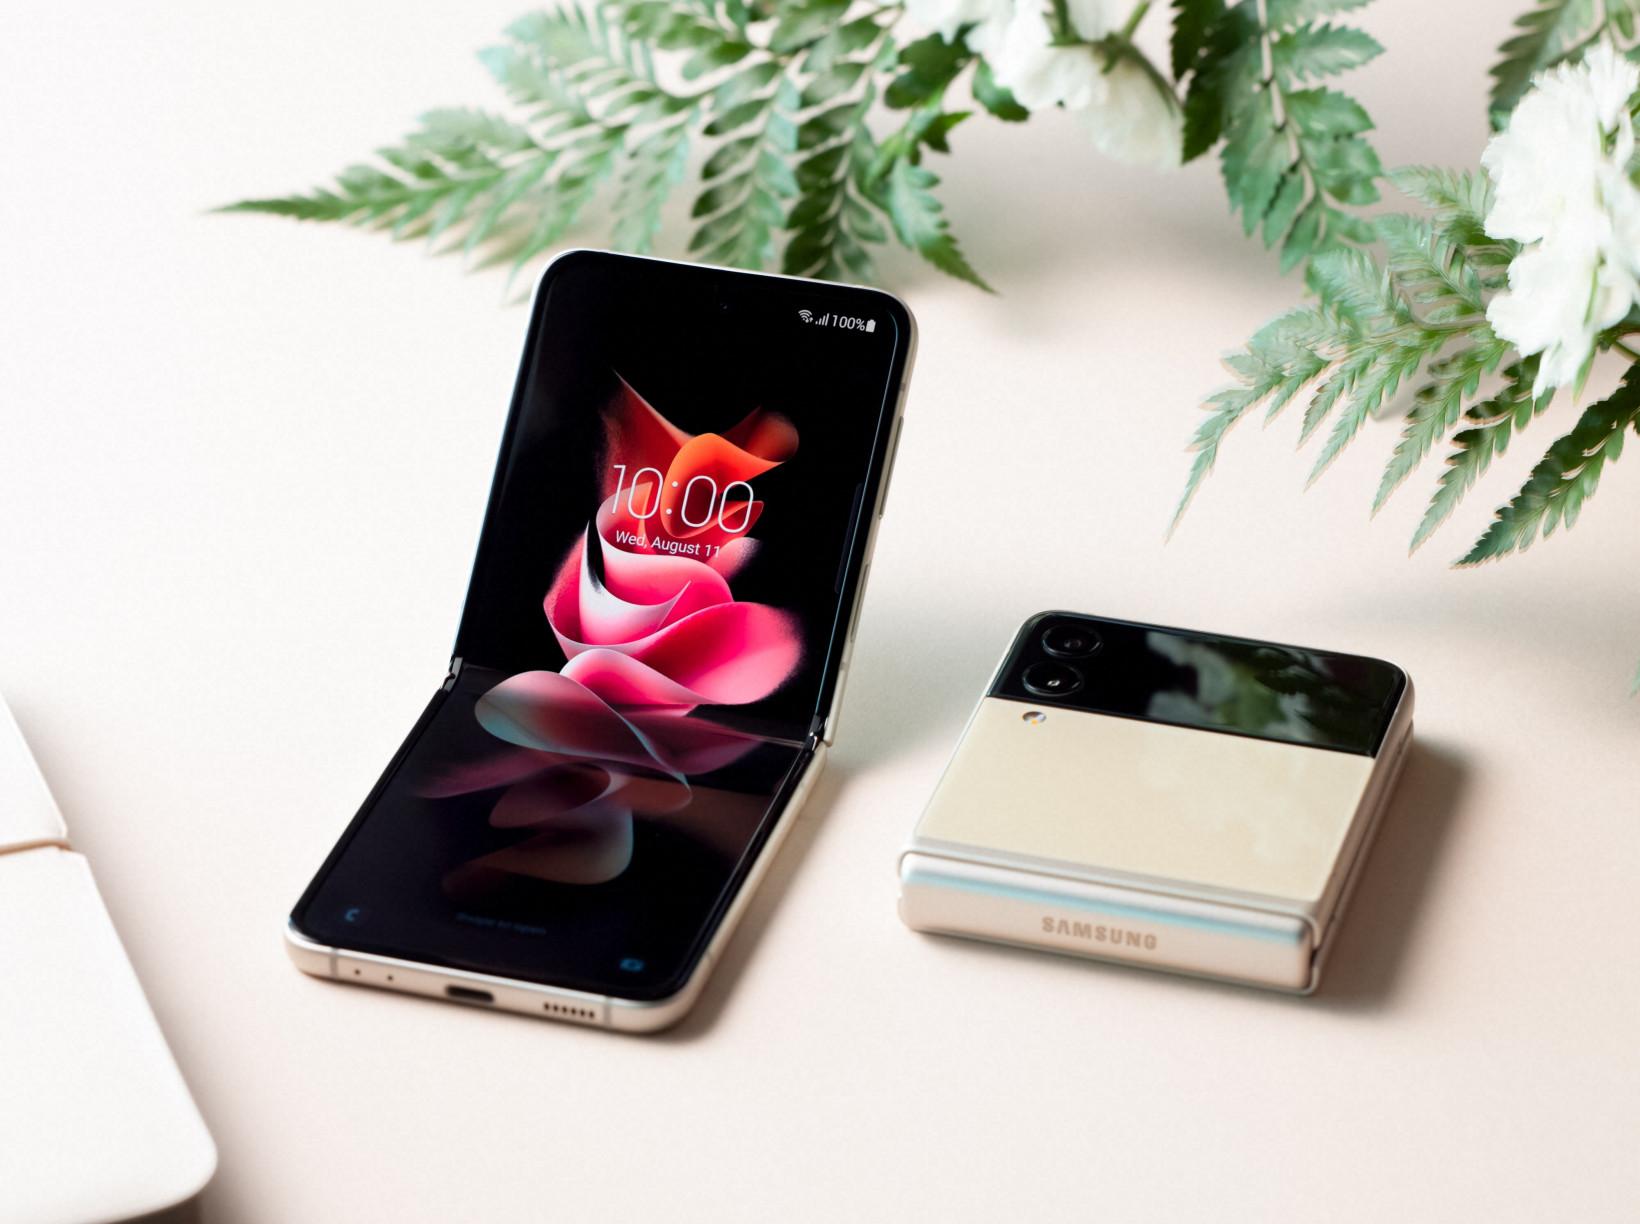 Samsung Galaxy Z Flip 3 foldable